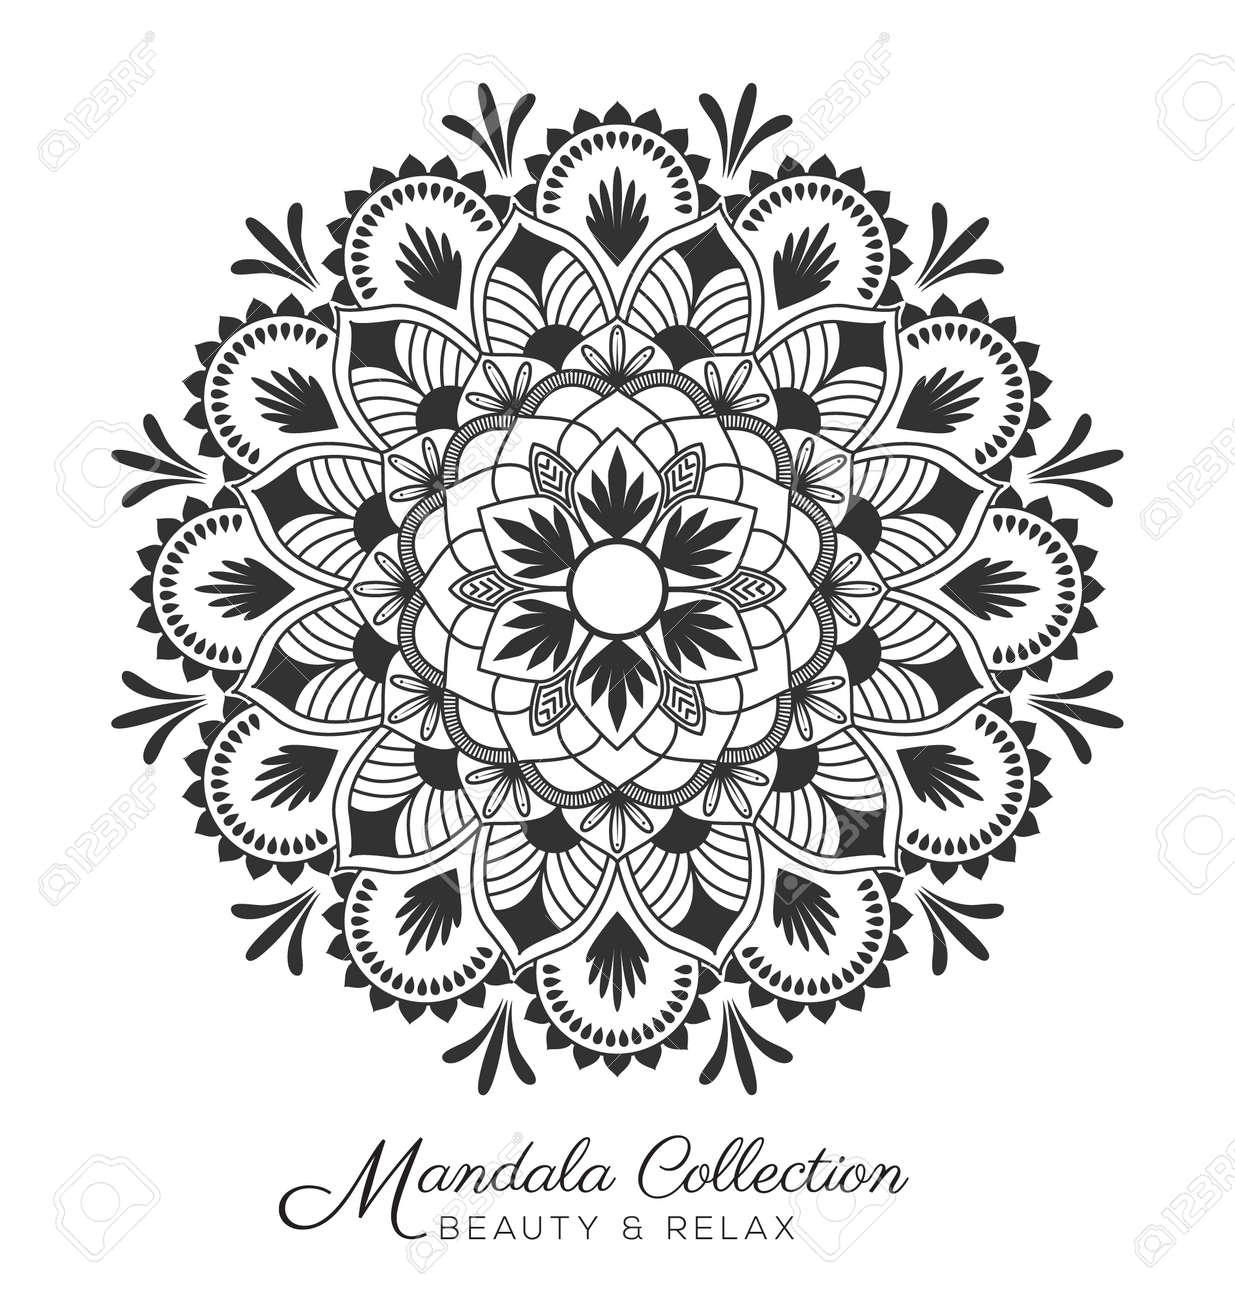 tibetan mandala decorative ornament design for coloring page